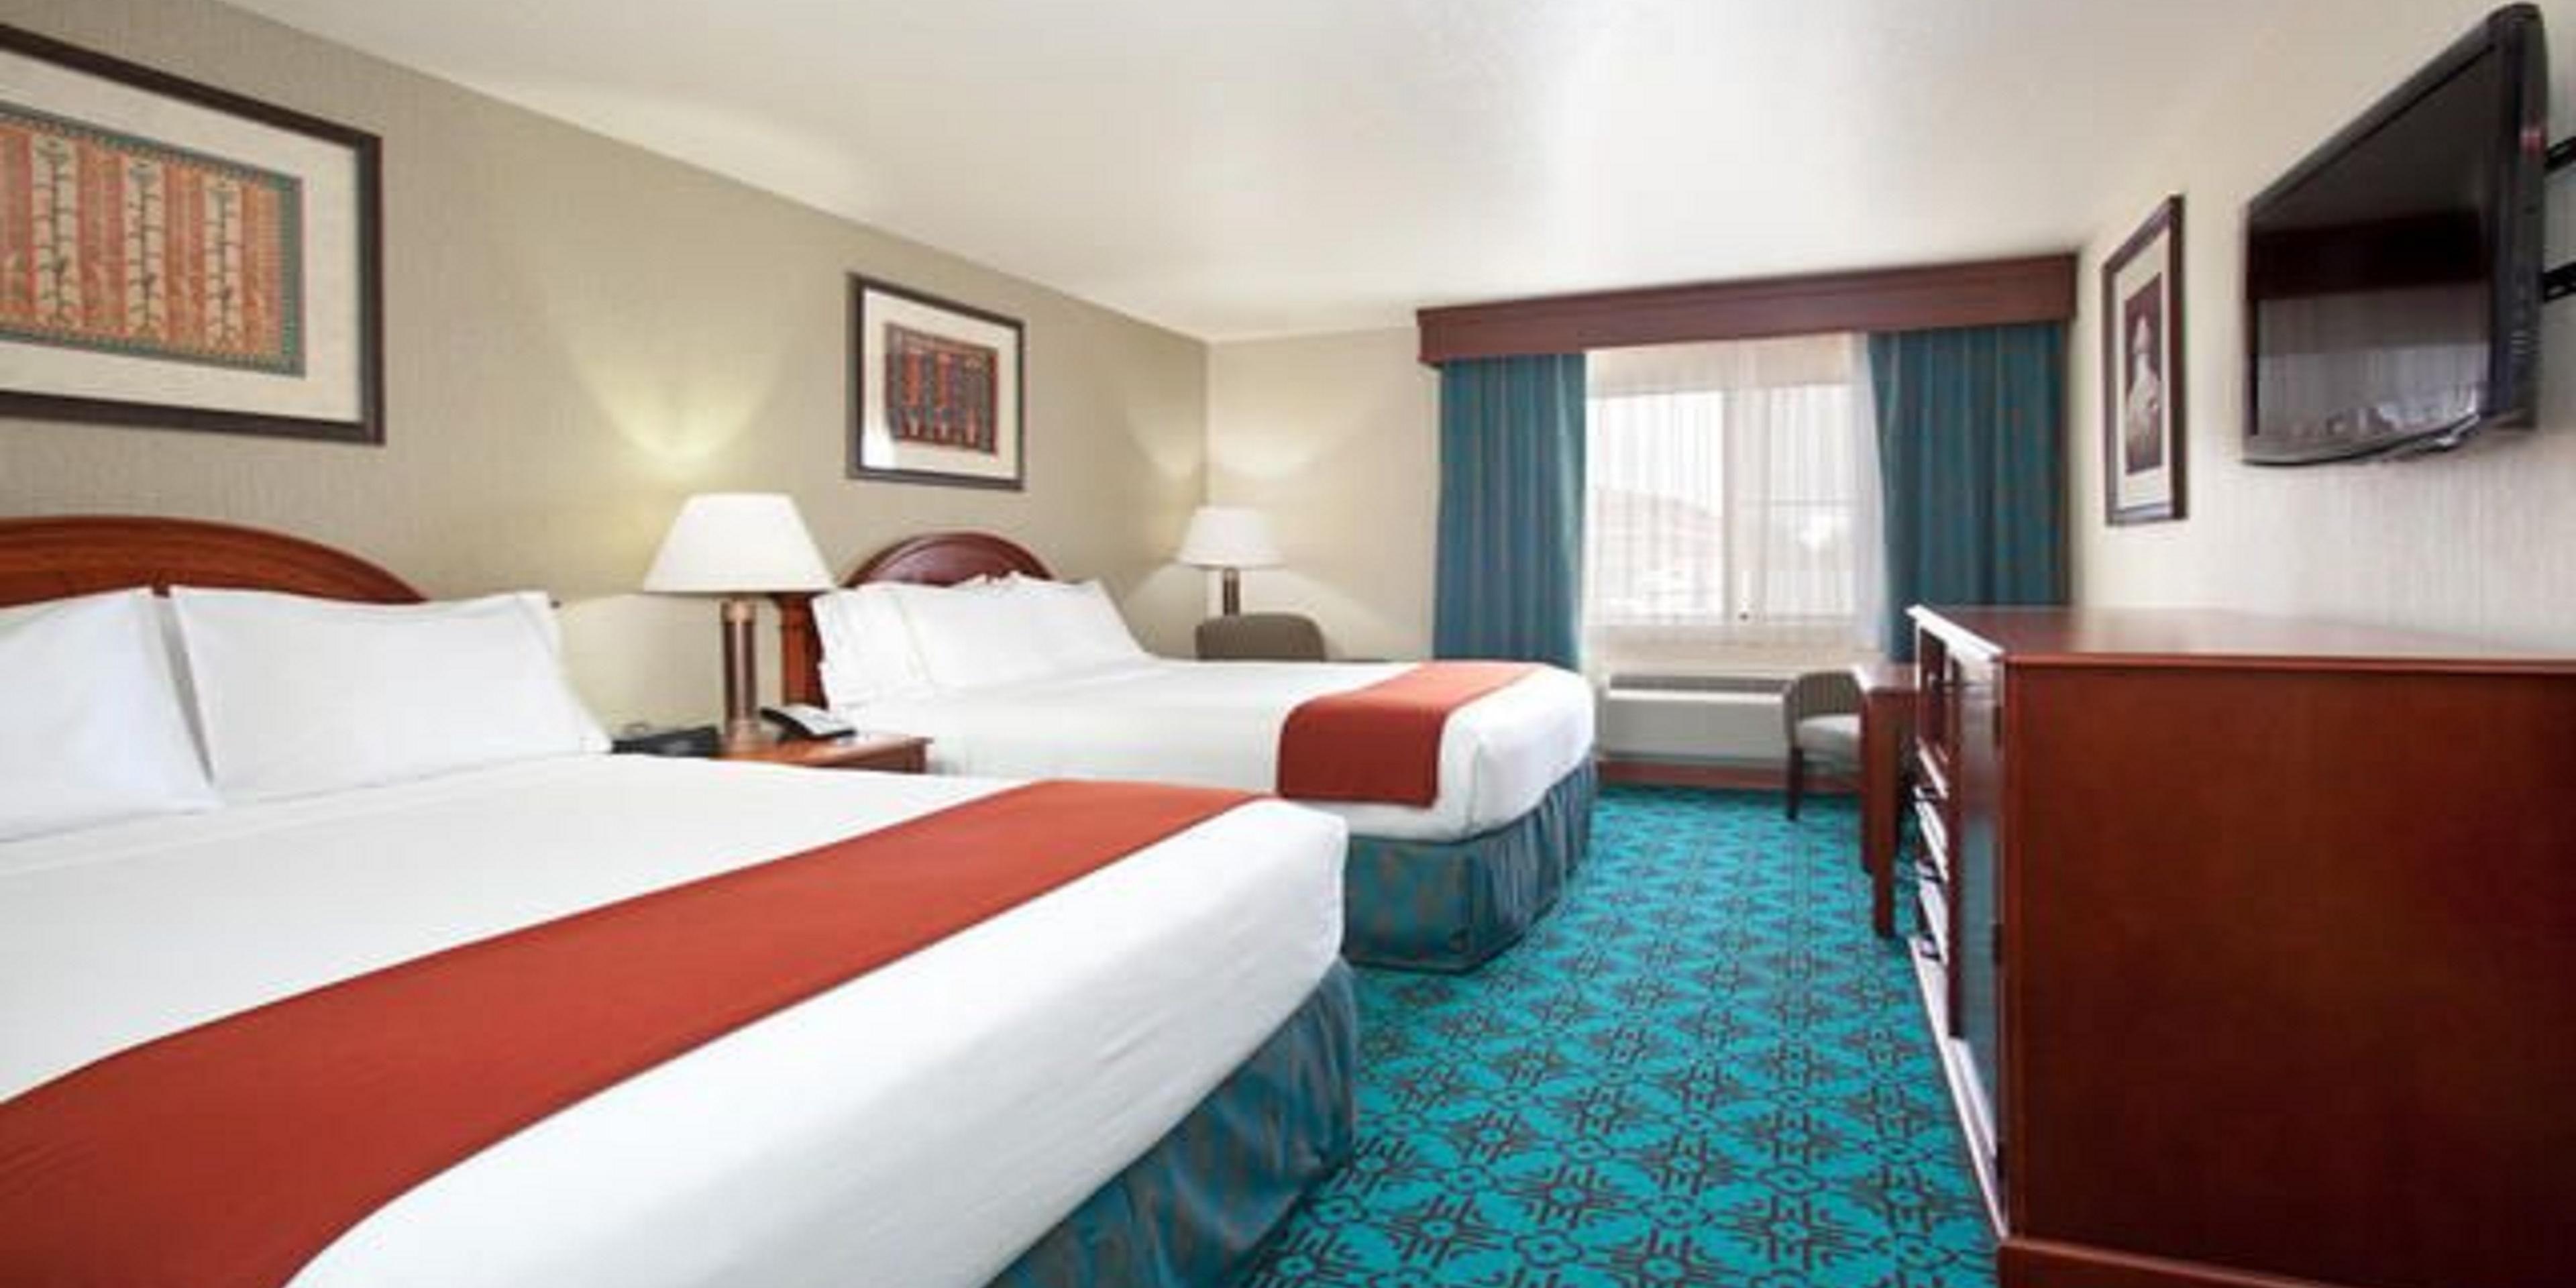 Holiday Inn Express Cortez 3617959381 2x1